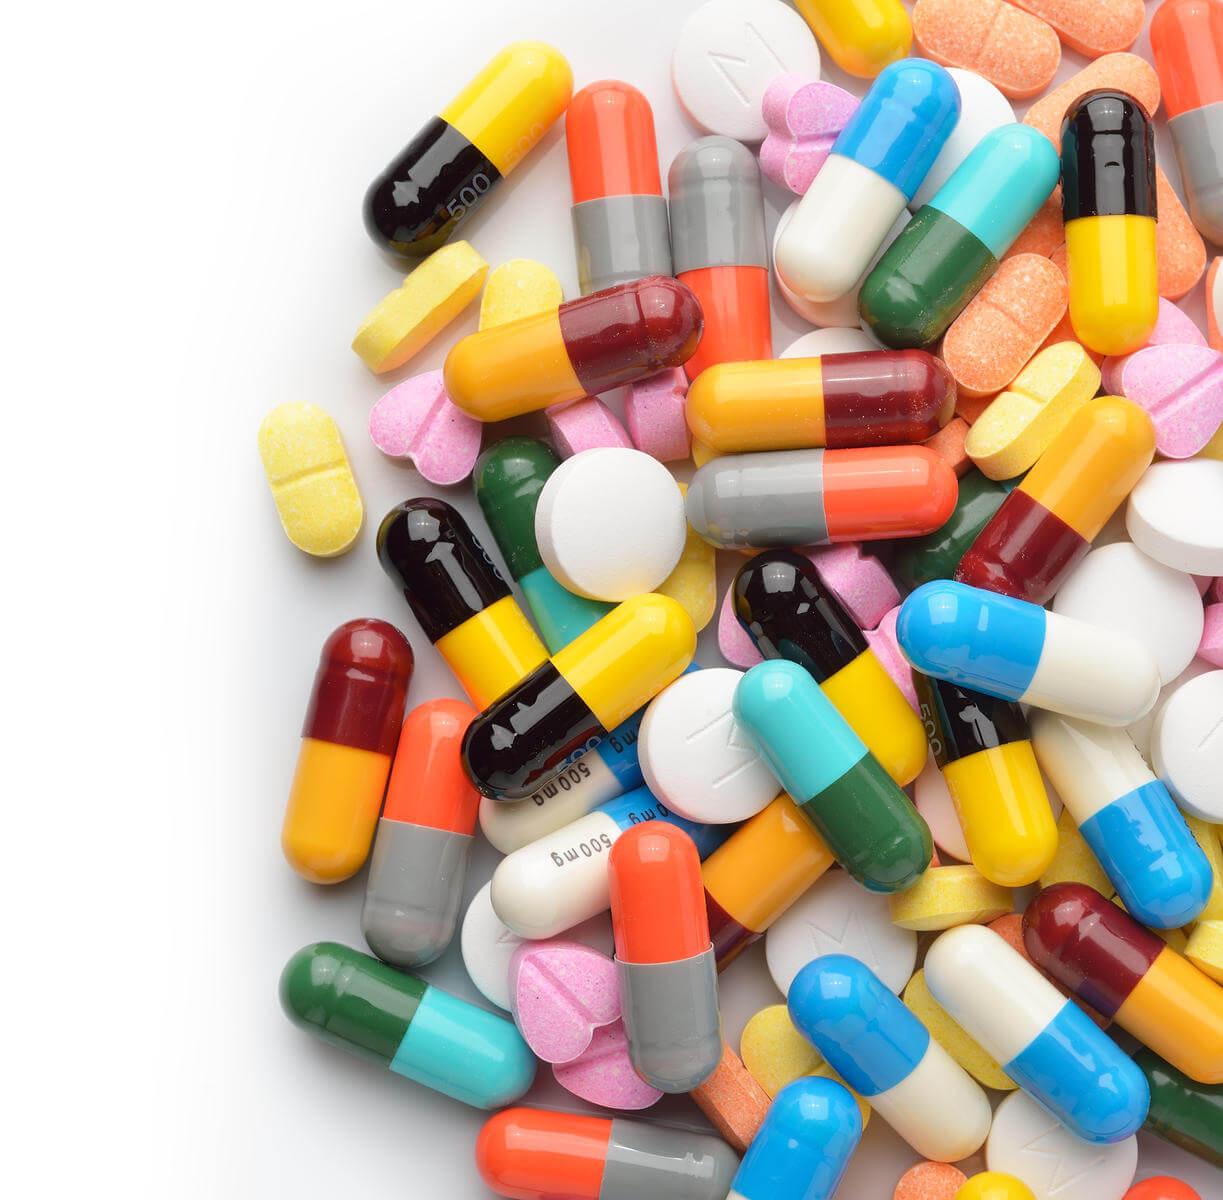 Можно ли применять антибиотики